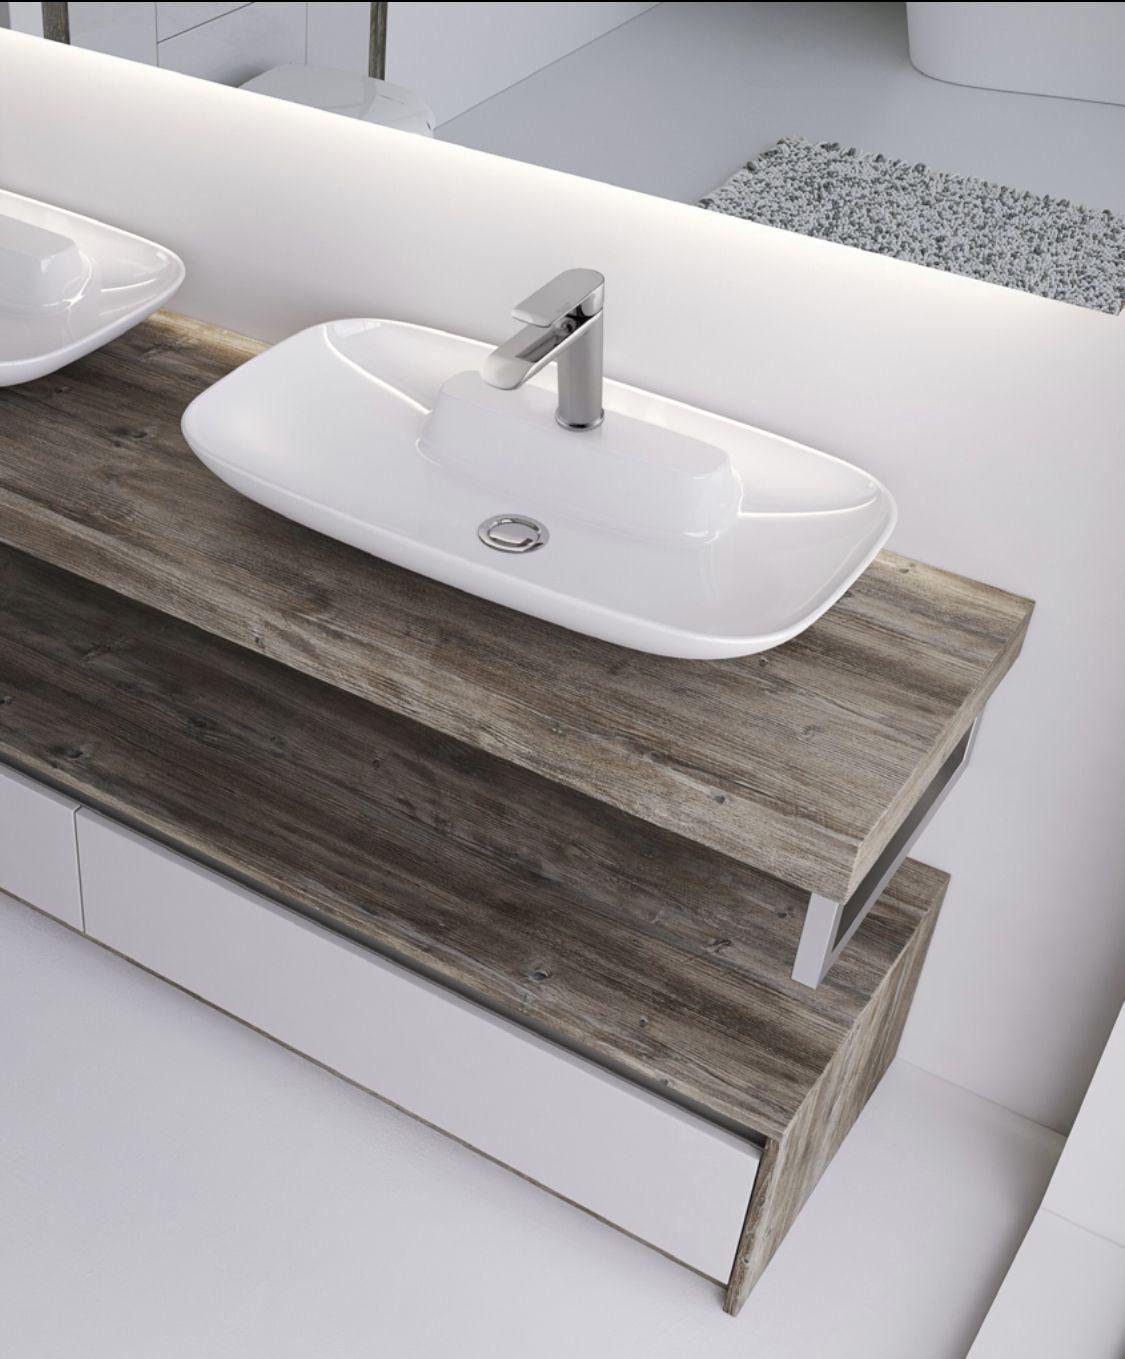 Www Pitrebathrooms Com Home Decor Decor Sink [ 1359 x 1125 Pixel ]